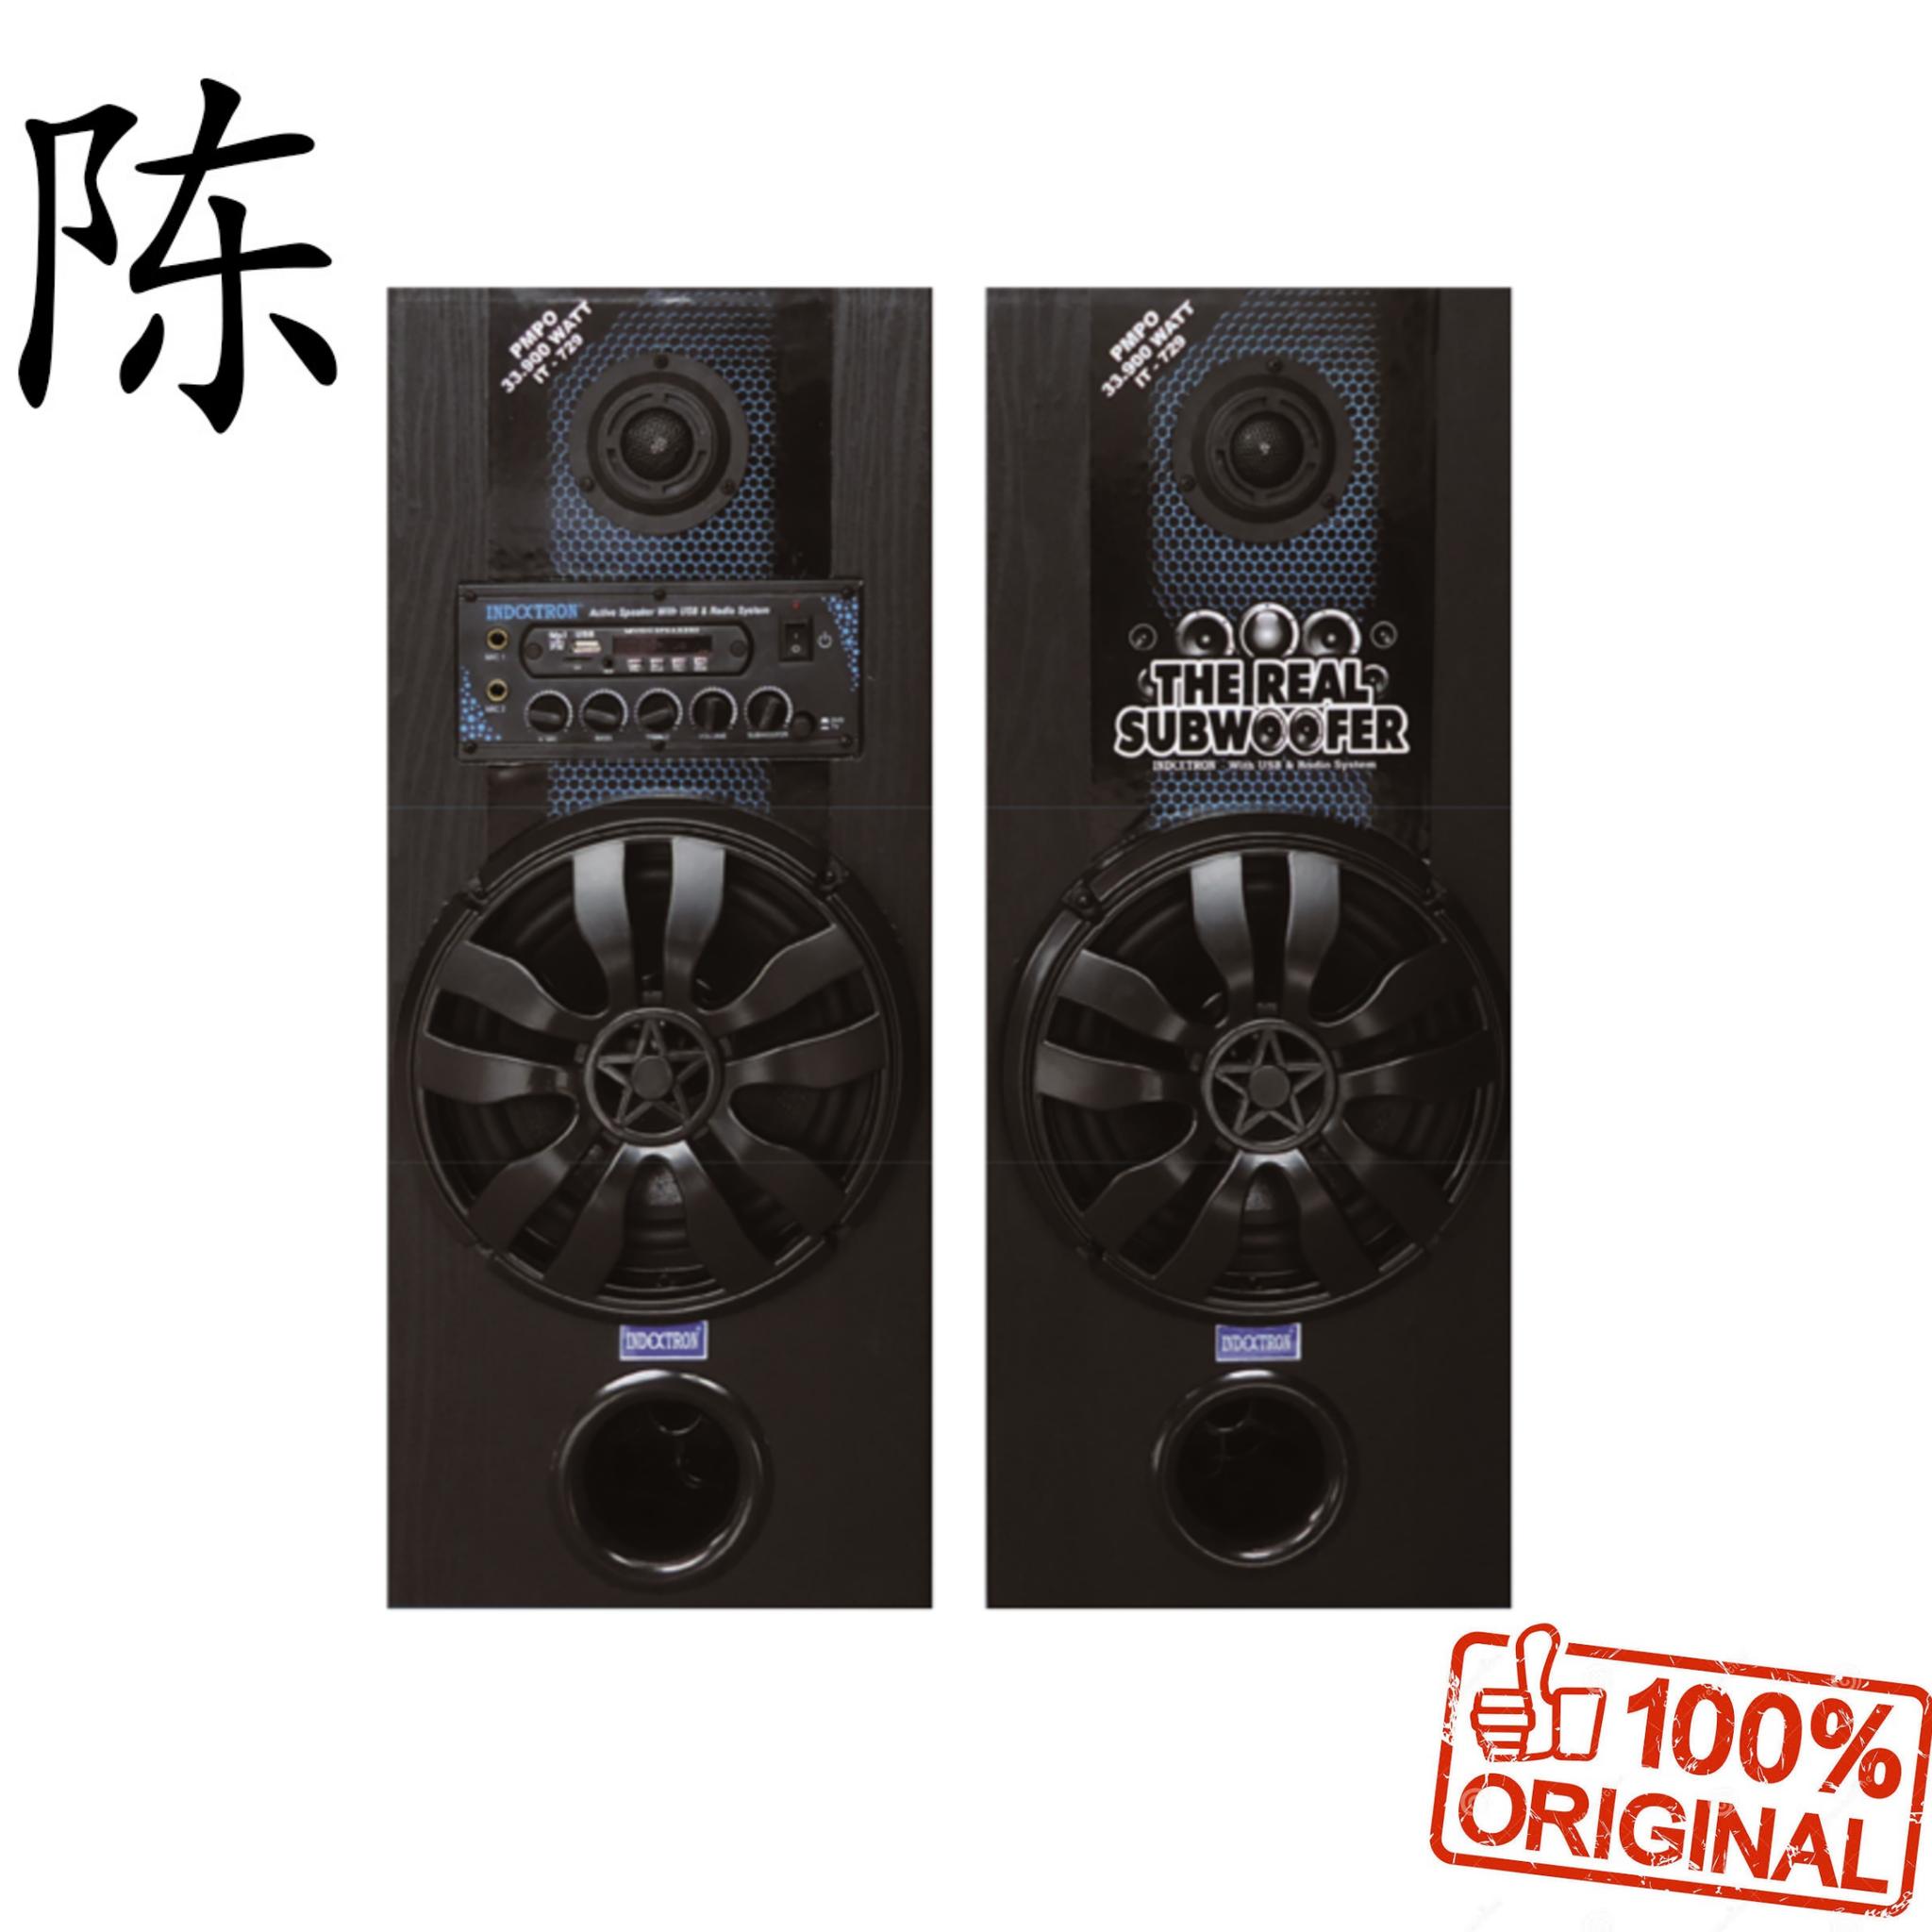 DISKON Speaker Aktif Indextron Subwoofer - IT 729 (KHUSUS GOJEK DAN GRAB) bd1fde887e